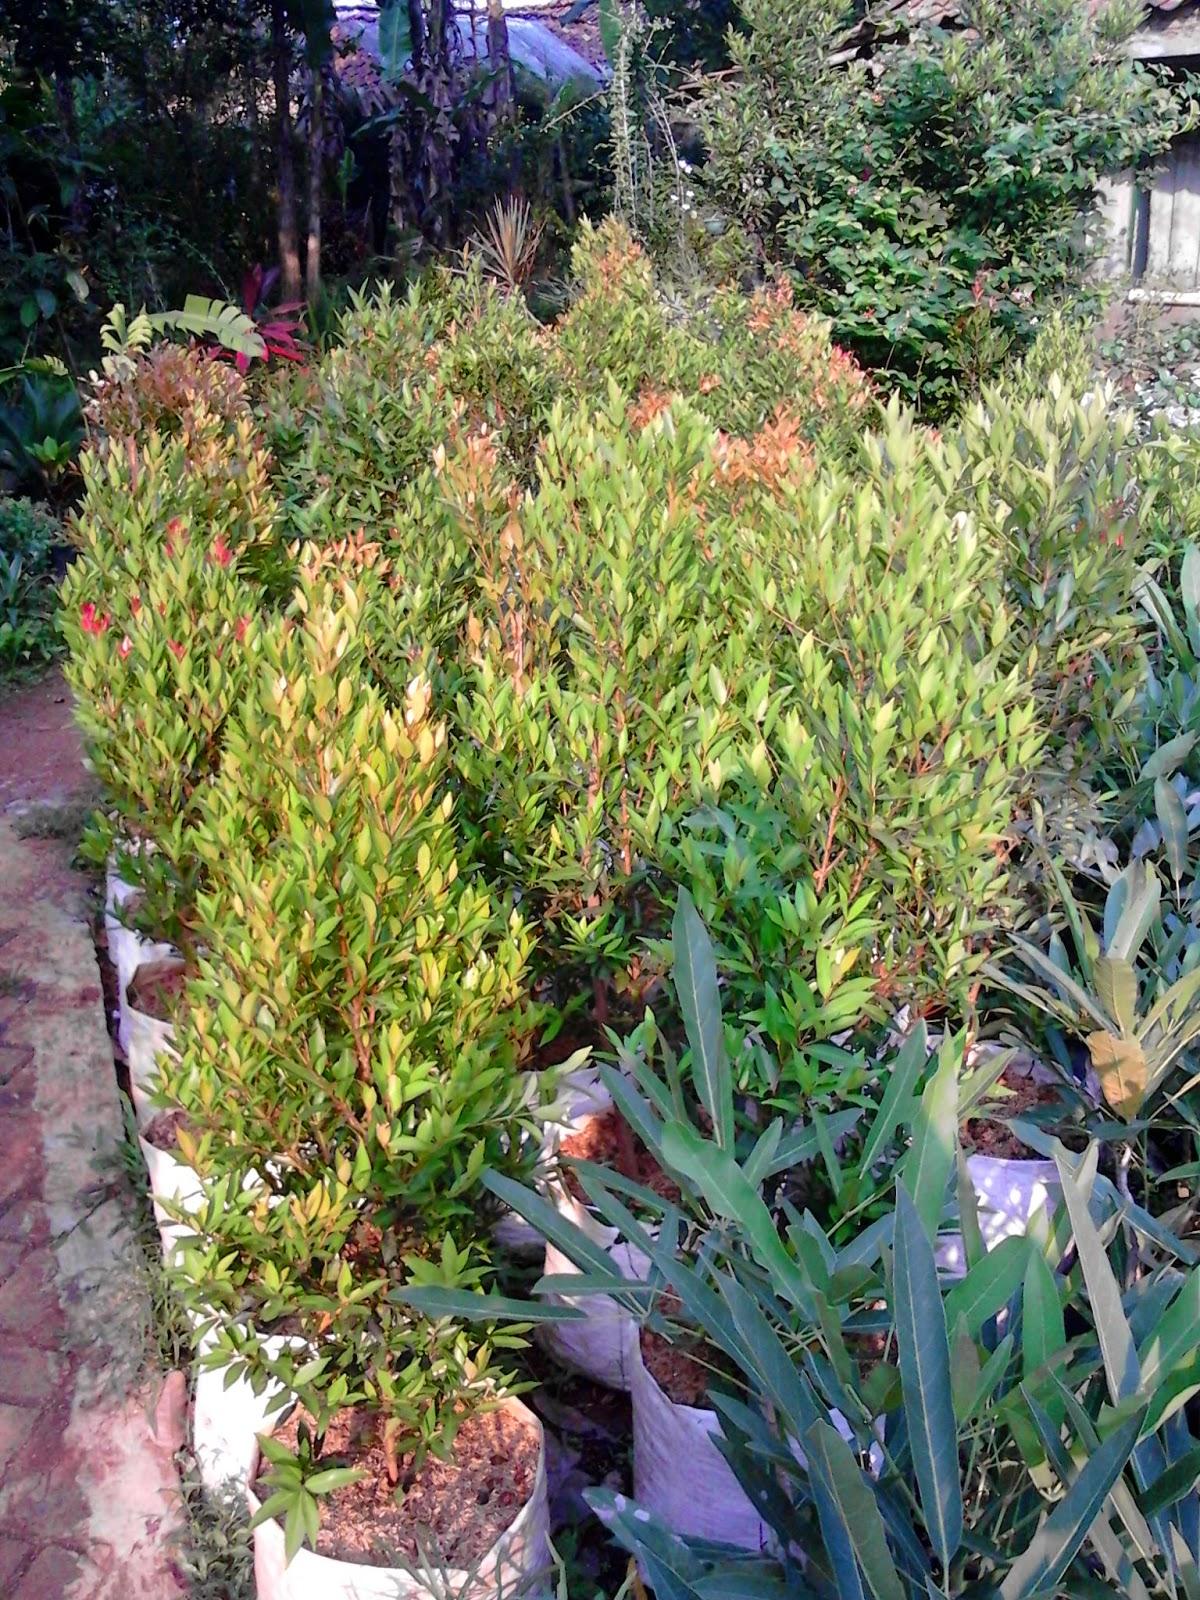 Jual pohon  pucuk merah | untuk pagar | untuk di bentuk | bibit pucuk merah | suplier tanaman | tanaman hias | jasa desain taman